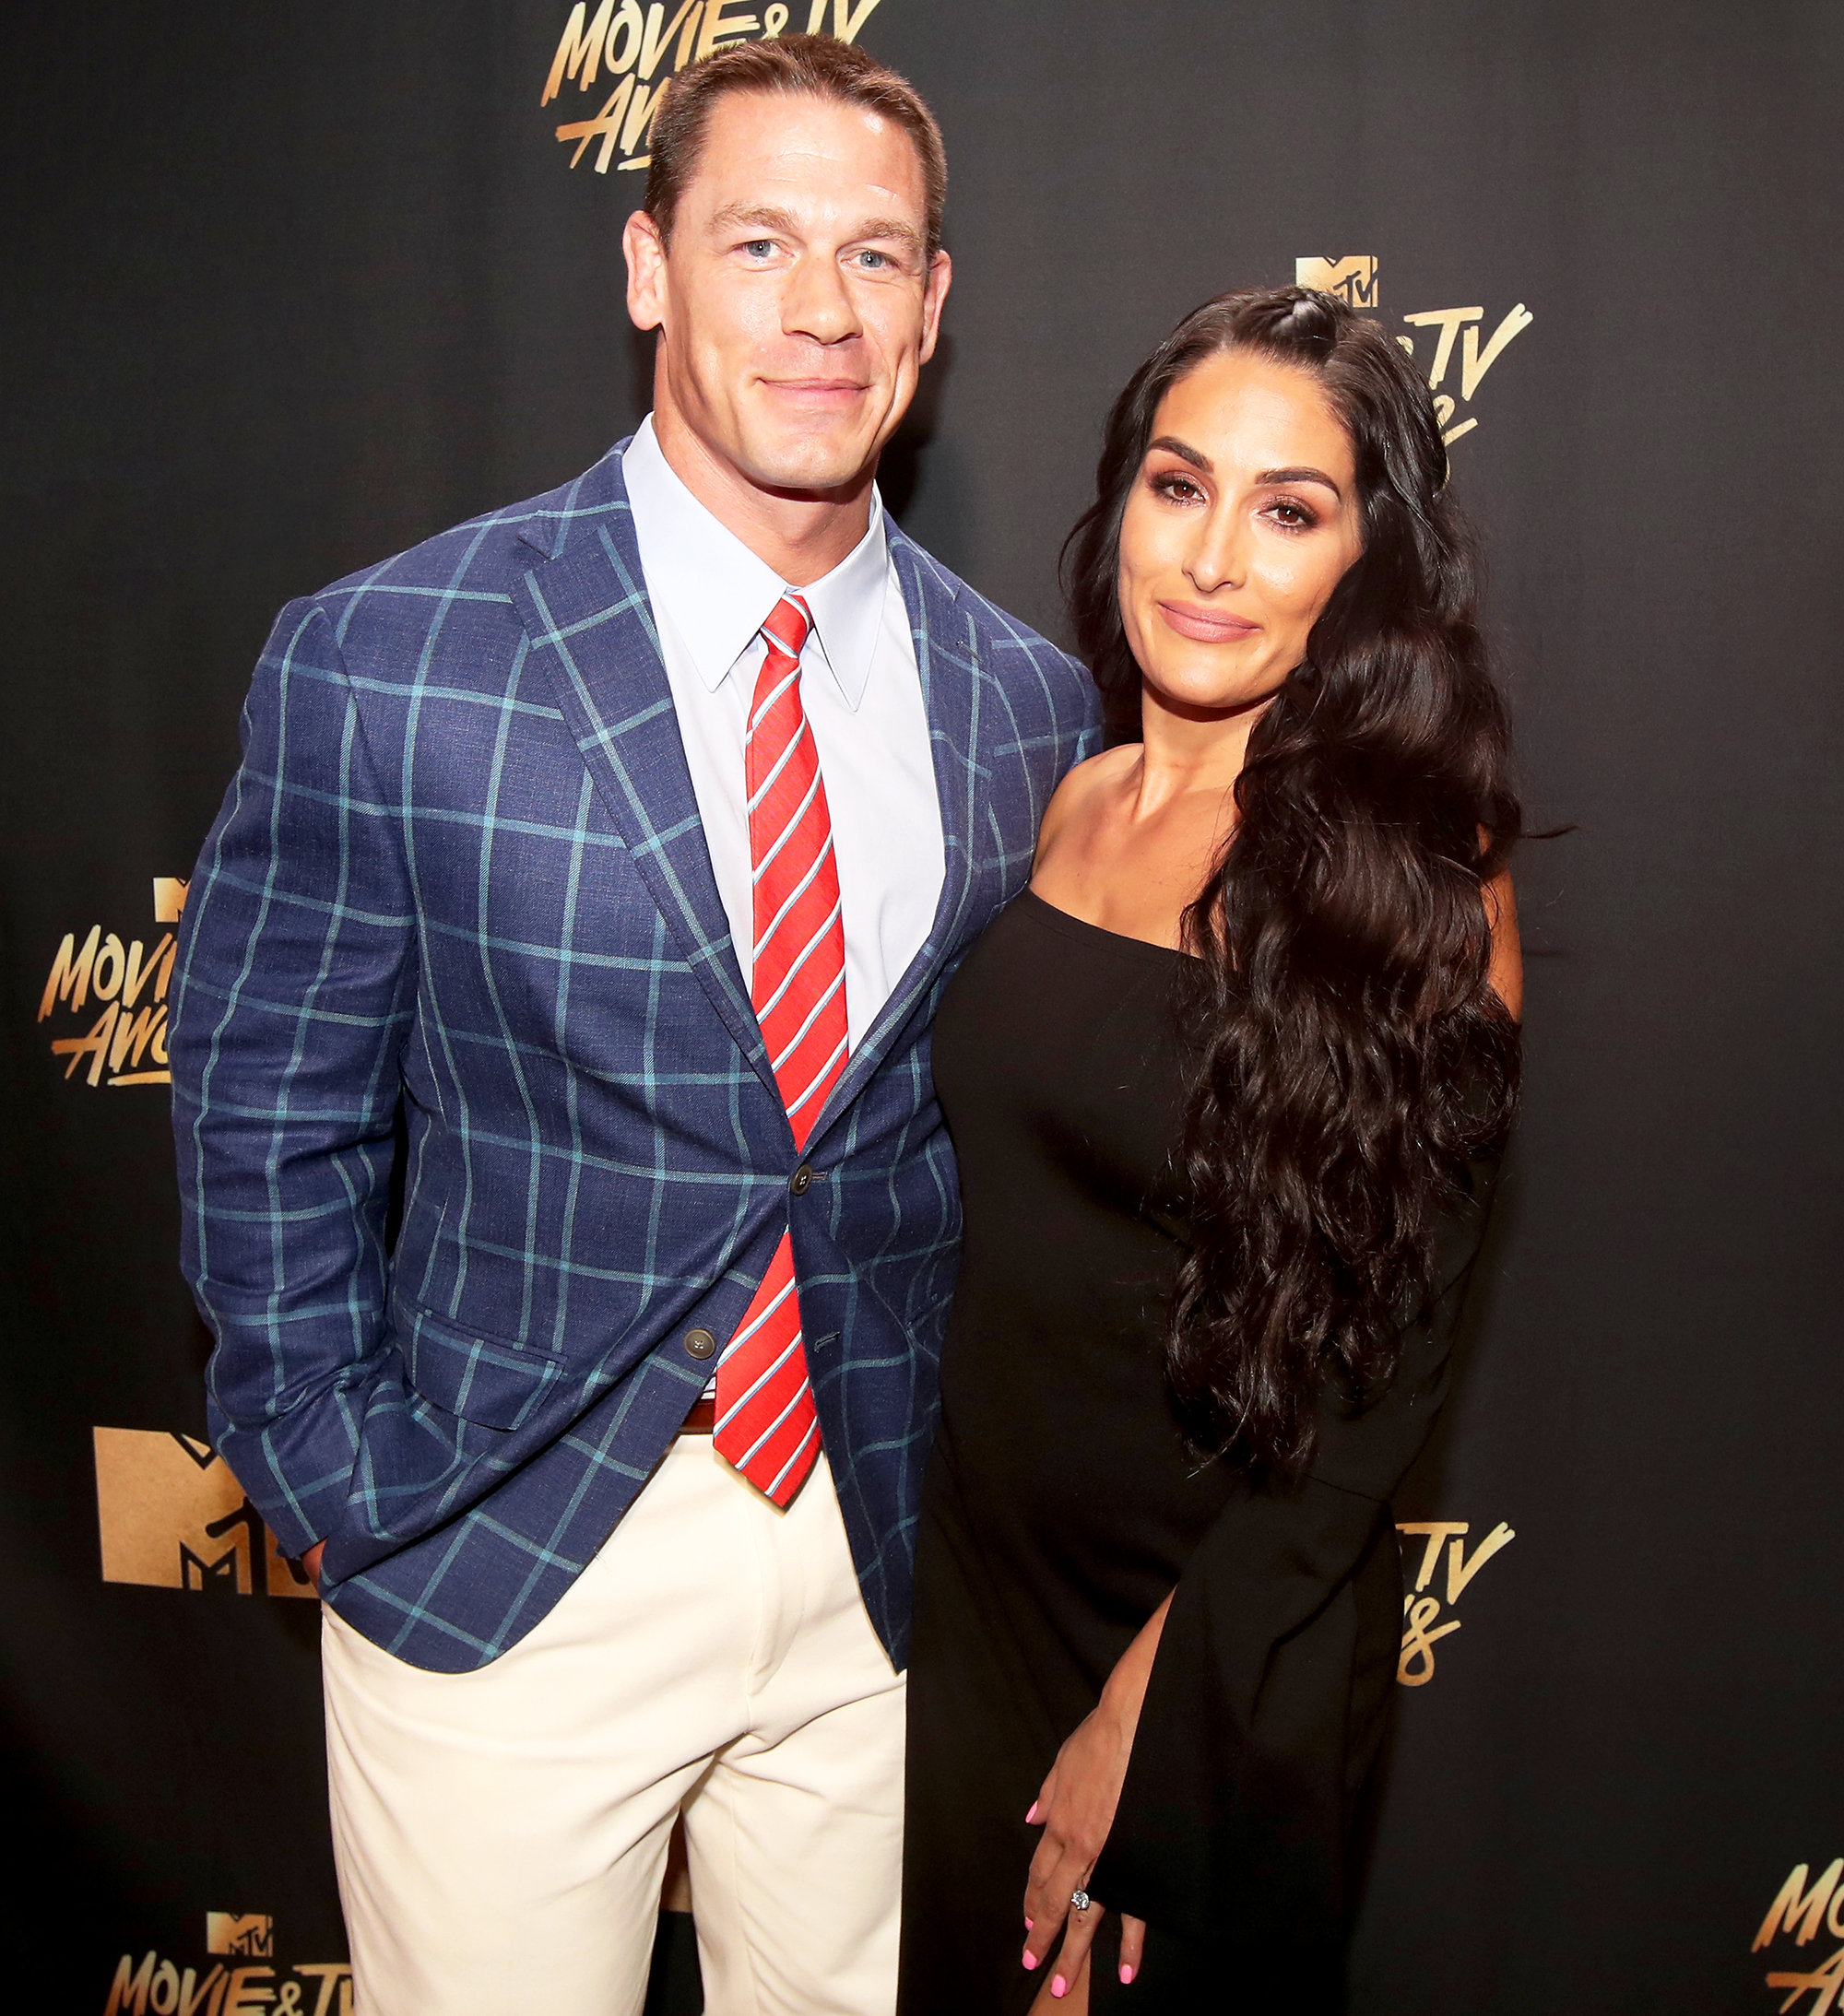 John Cena Made Ex-Fiancee Nikki Bella Sign a 75-Page Agreement